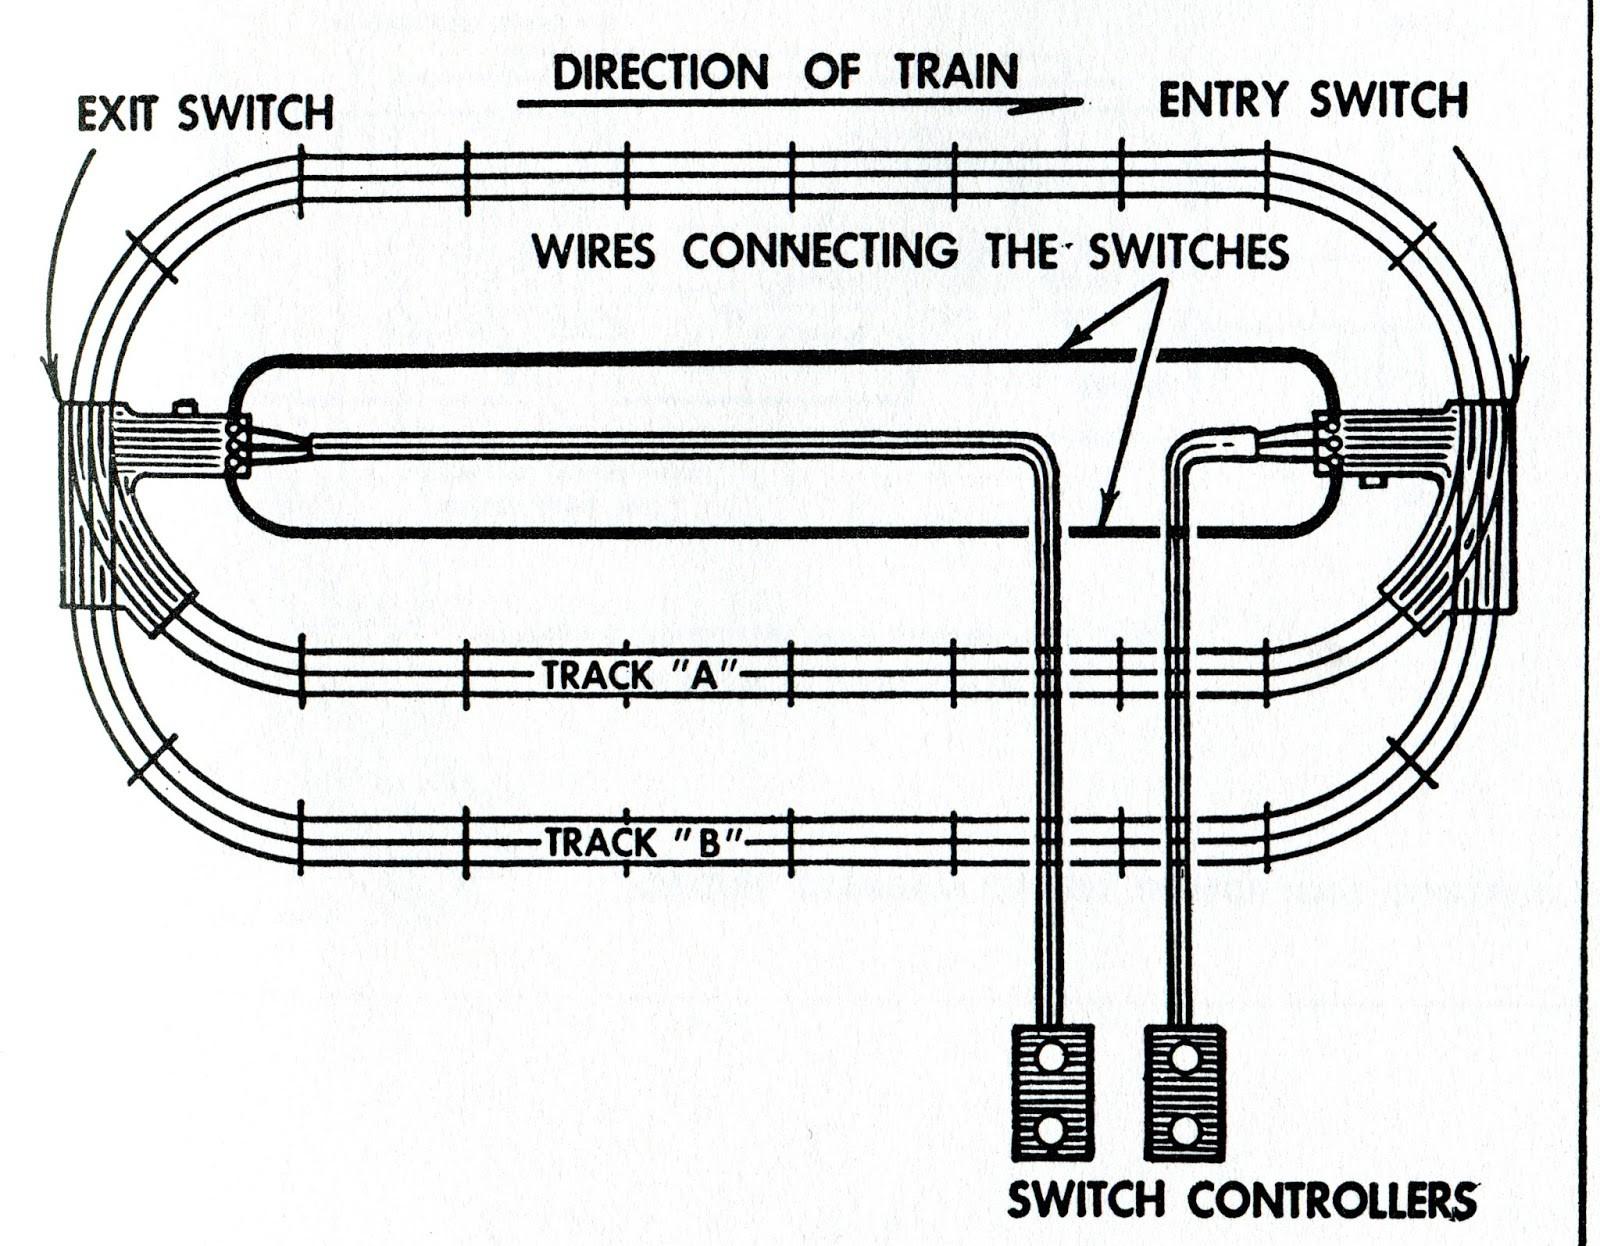 Lionel Train Wiring Guide